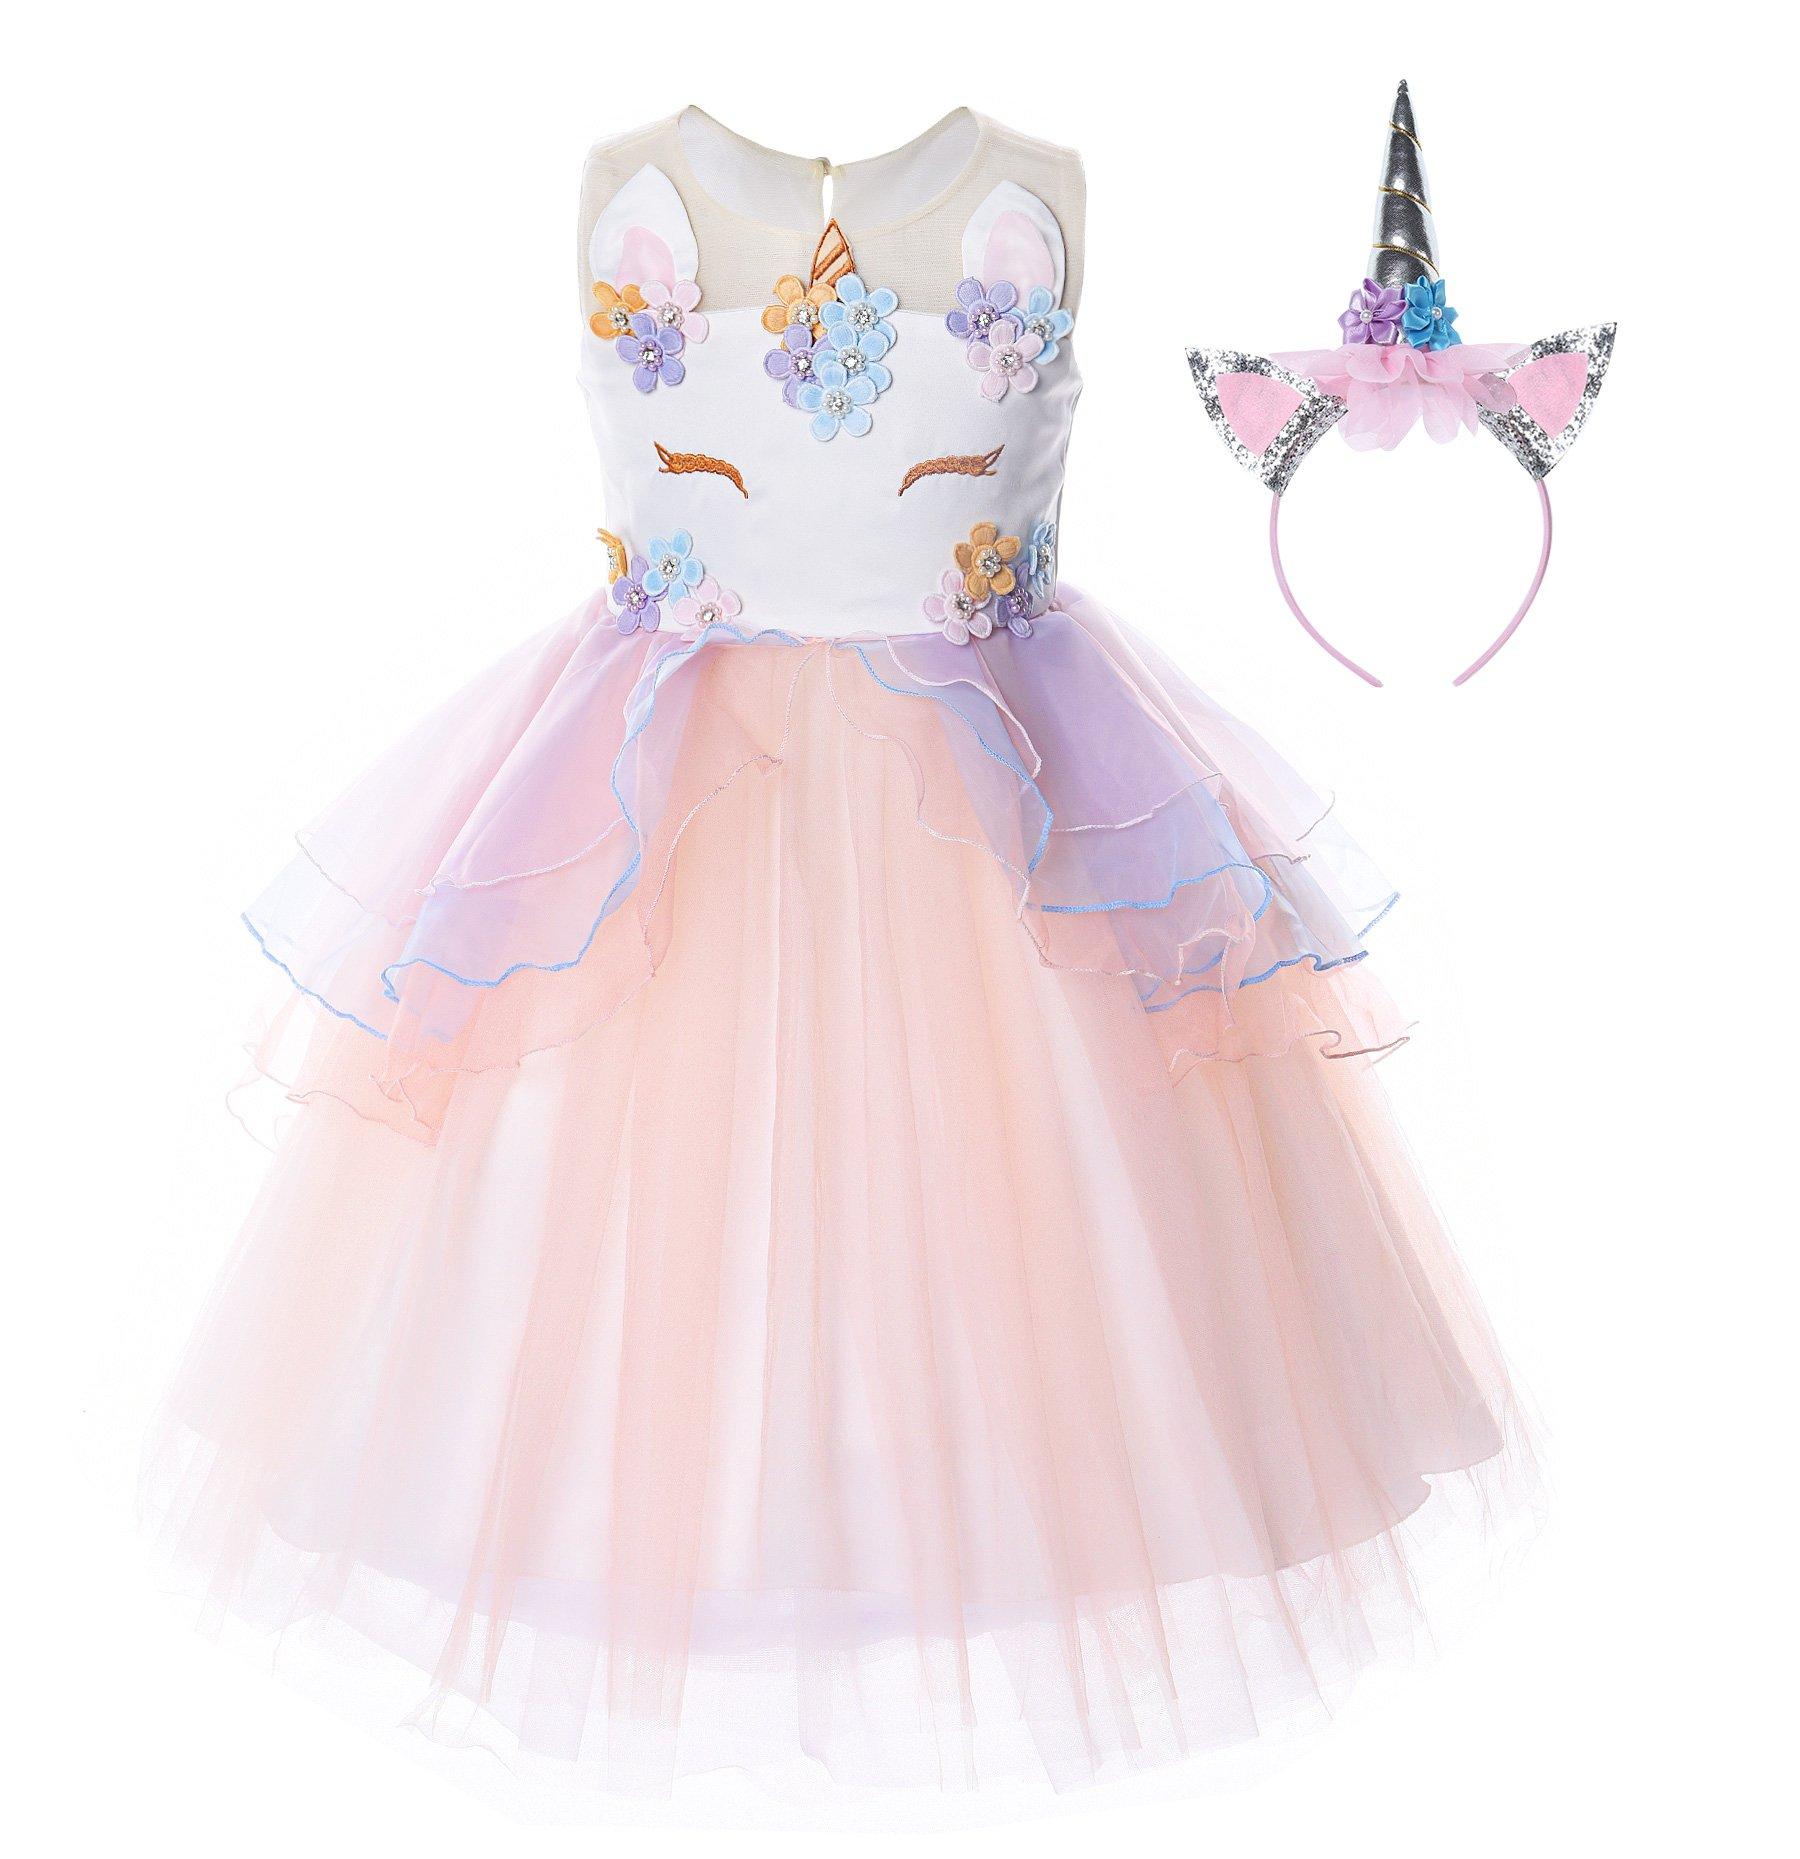 JerrisApparel Flower Girls Unicorn Costume Pageant Princess Party Dress (8-9 Years, Orange)